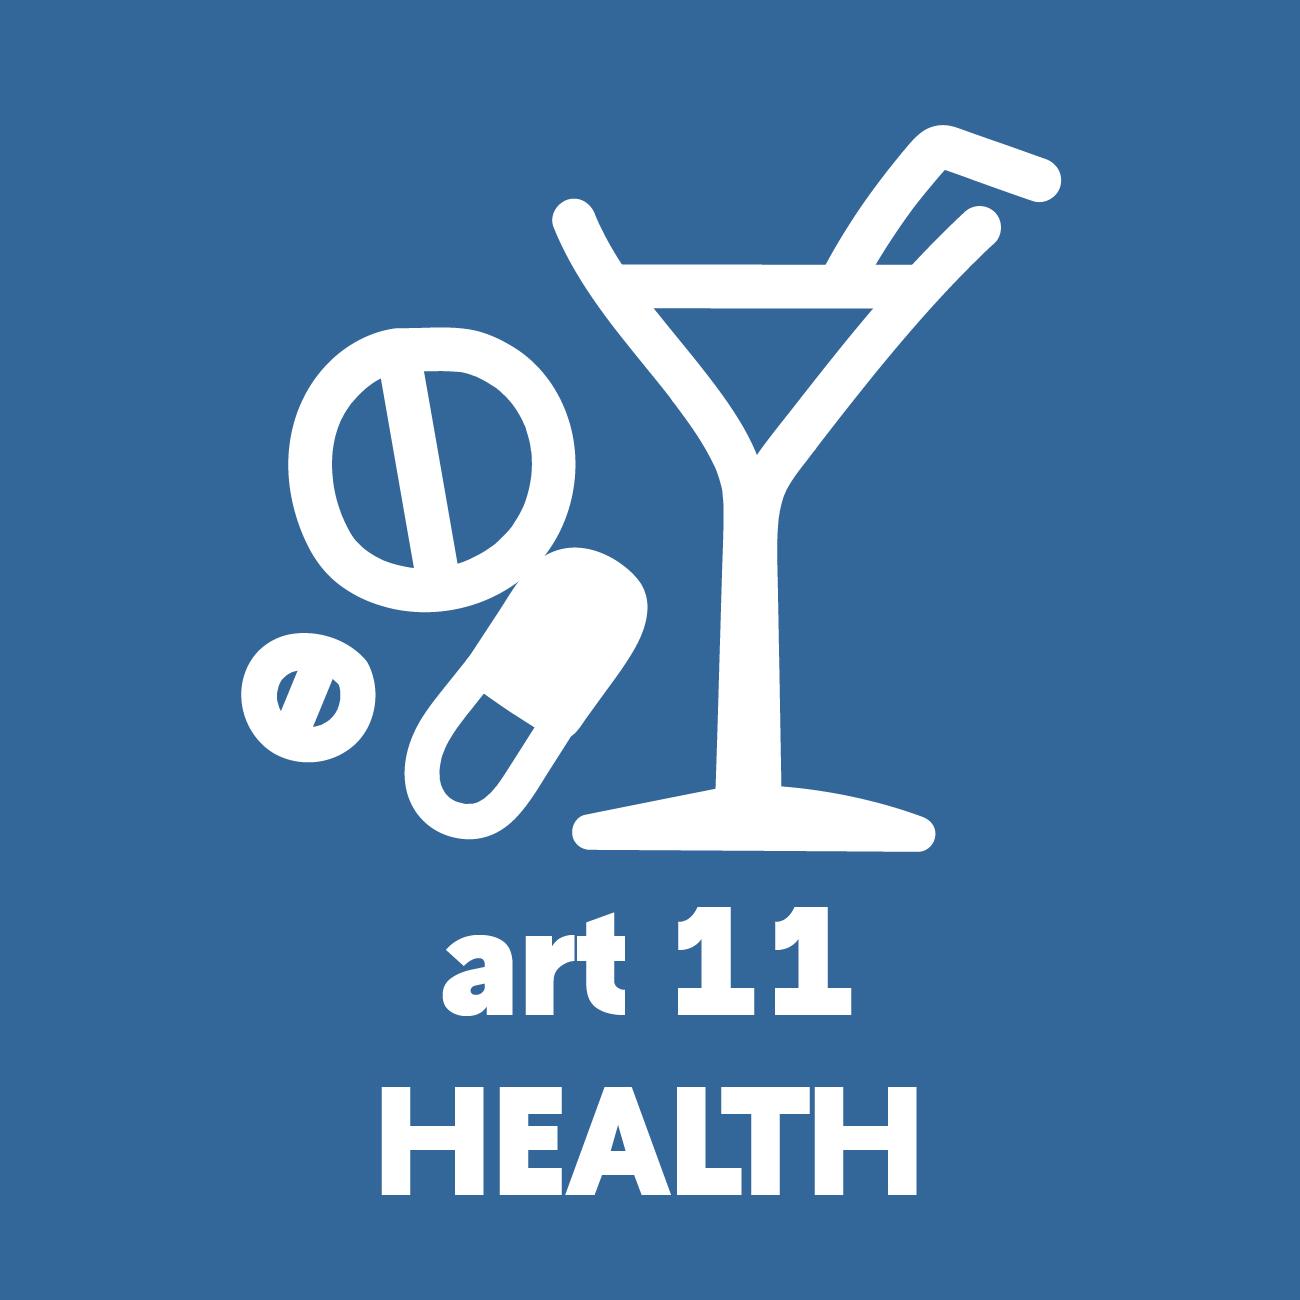 Art 11 health